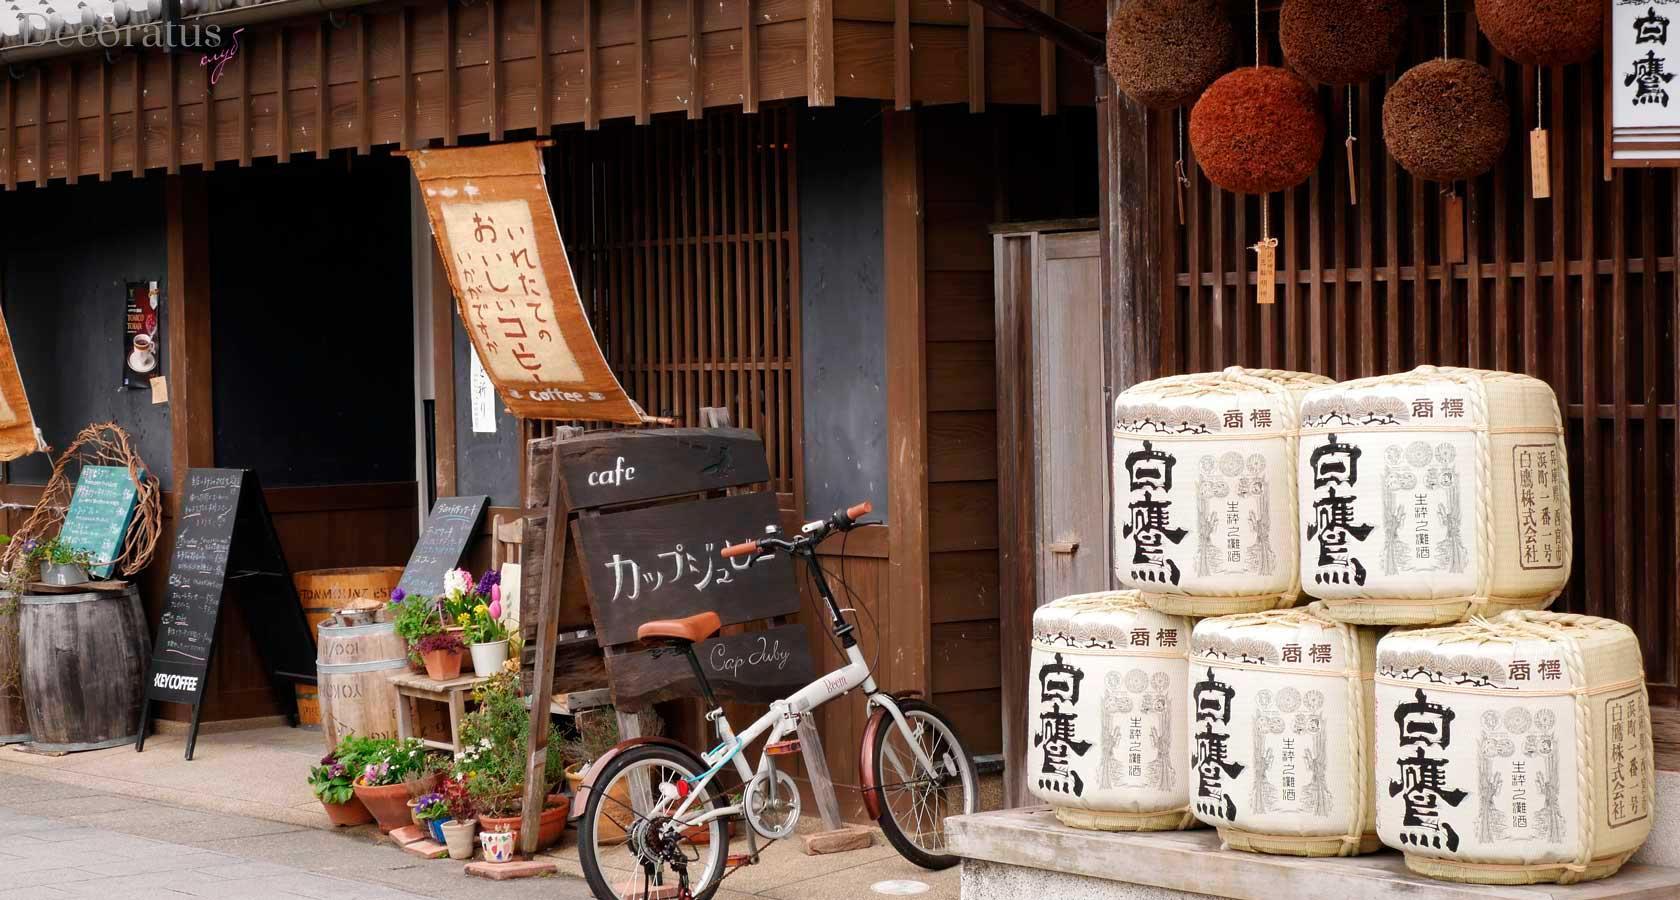 Святилище Храм Исэ Дзингу. Префектура Миэ, Япония